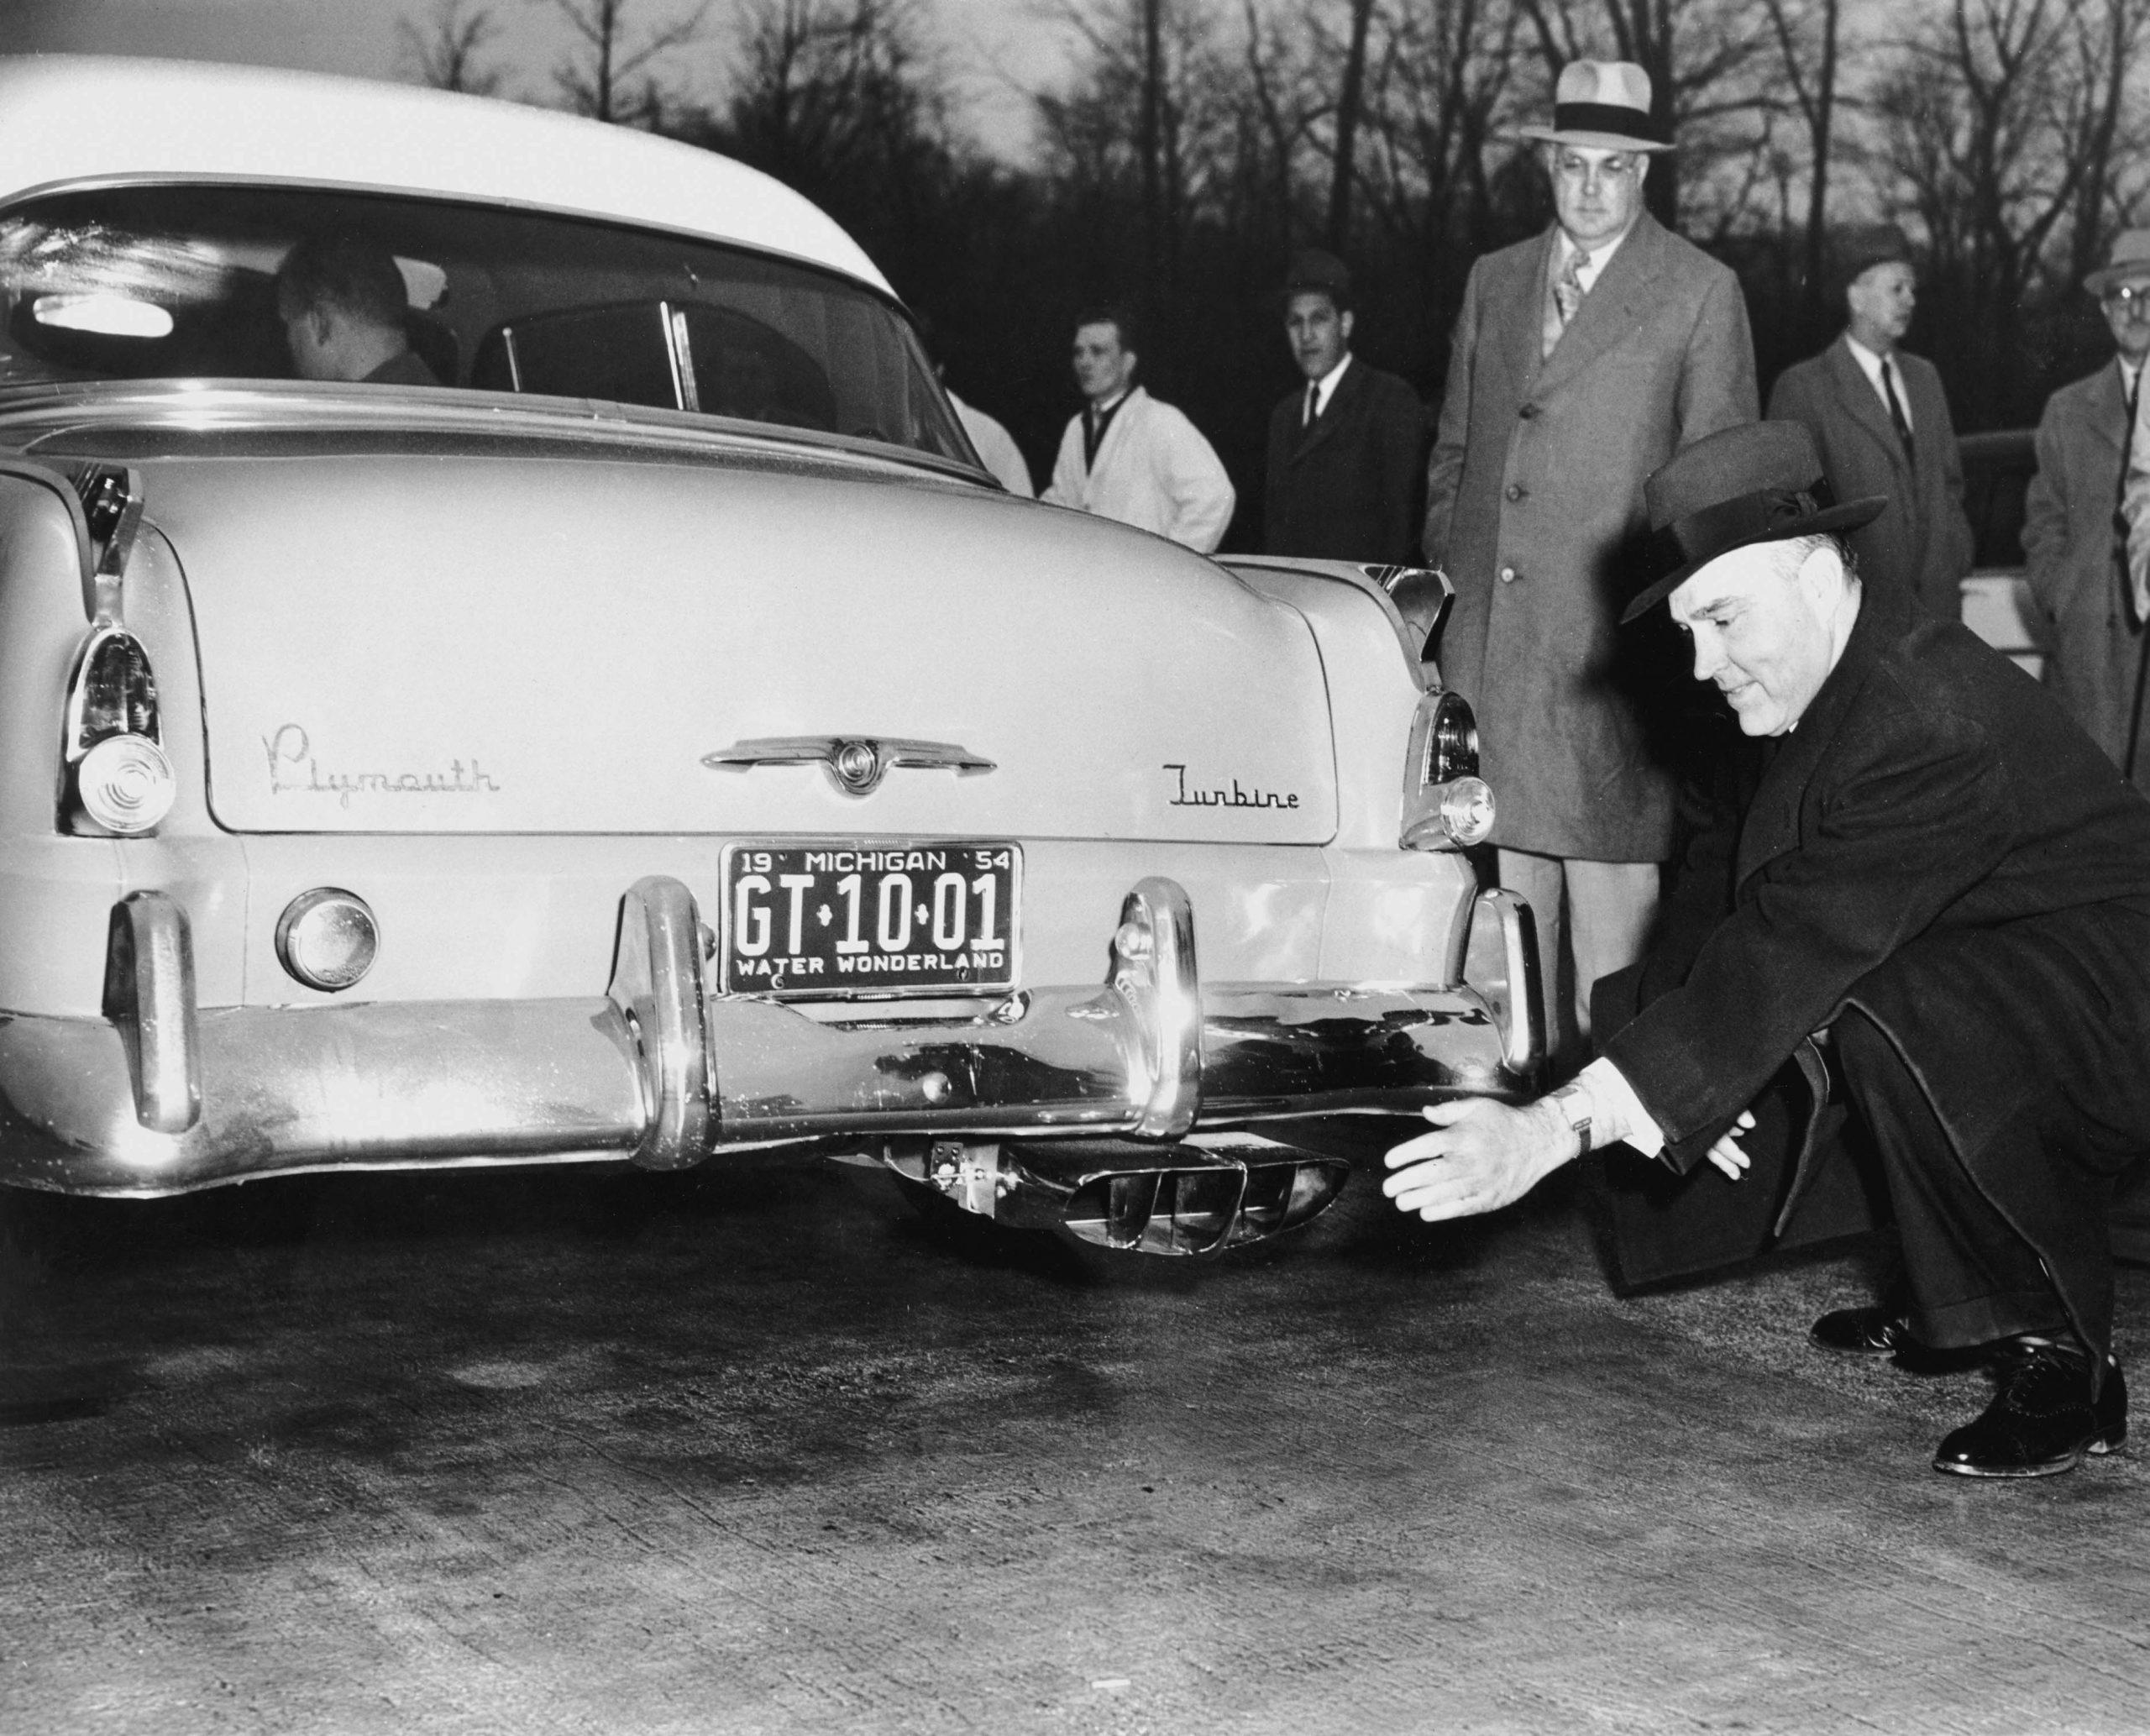 Chrysler Turbine history - 1954 Plymouth Turbine rear